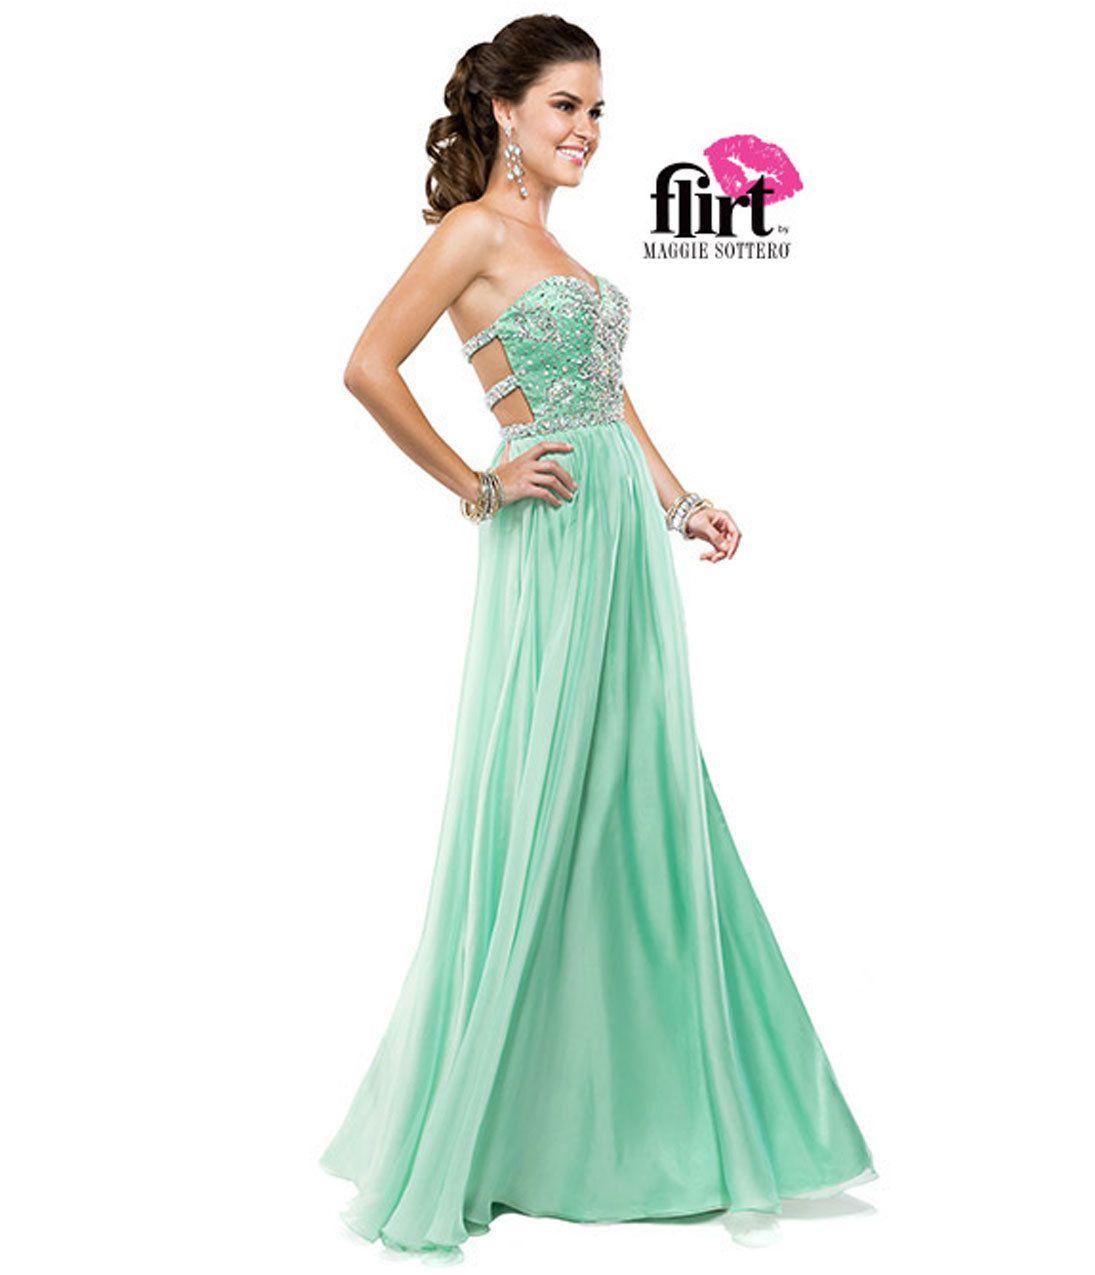 Flirt by Maggie Sottero 2014 Prom Dresses - Sea Mist A-Line ...